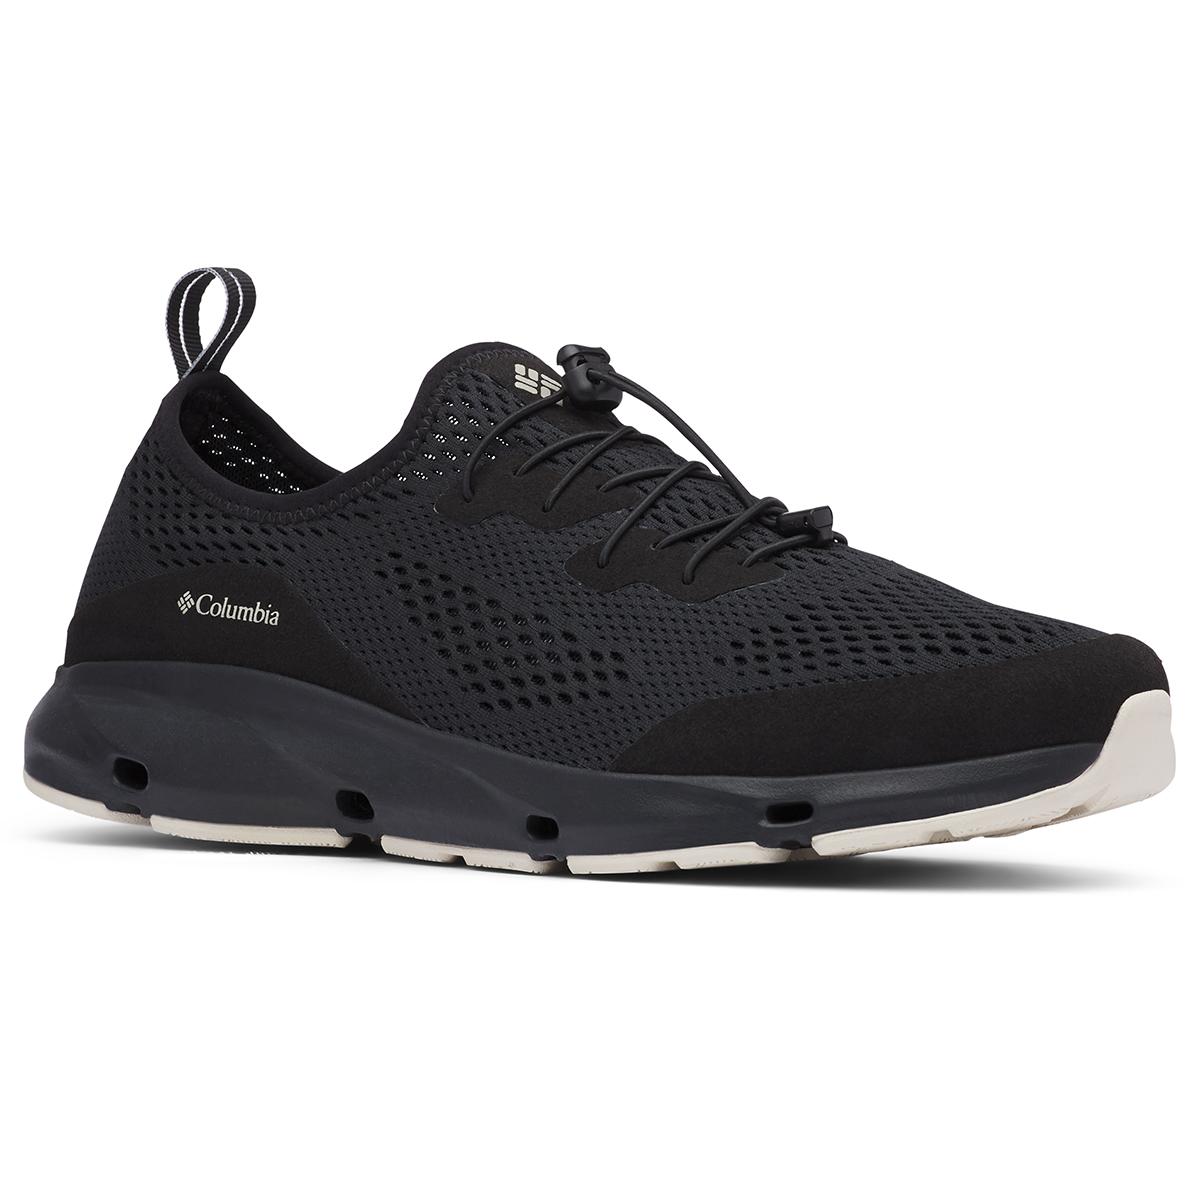 Columbia Men's Vent Trail Running Shoe - Black, 12